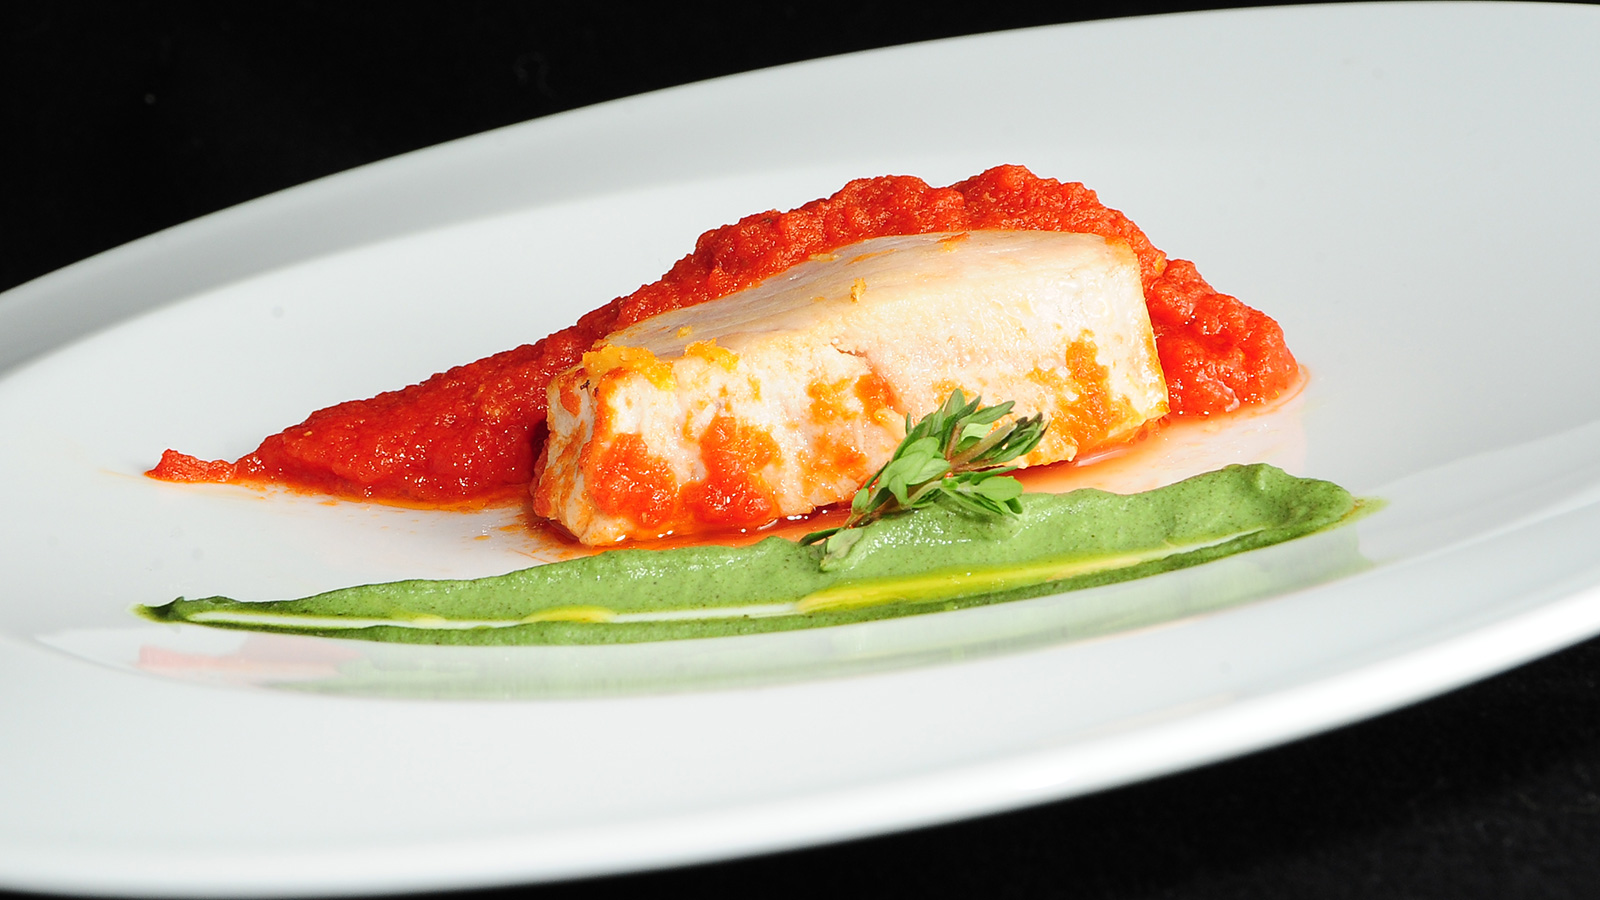 At n con tomate sergio fern ndez receta canal cocina for Canal cocina sergio fernandez